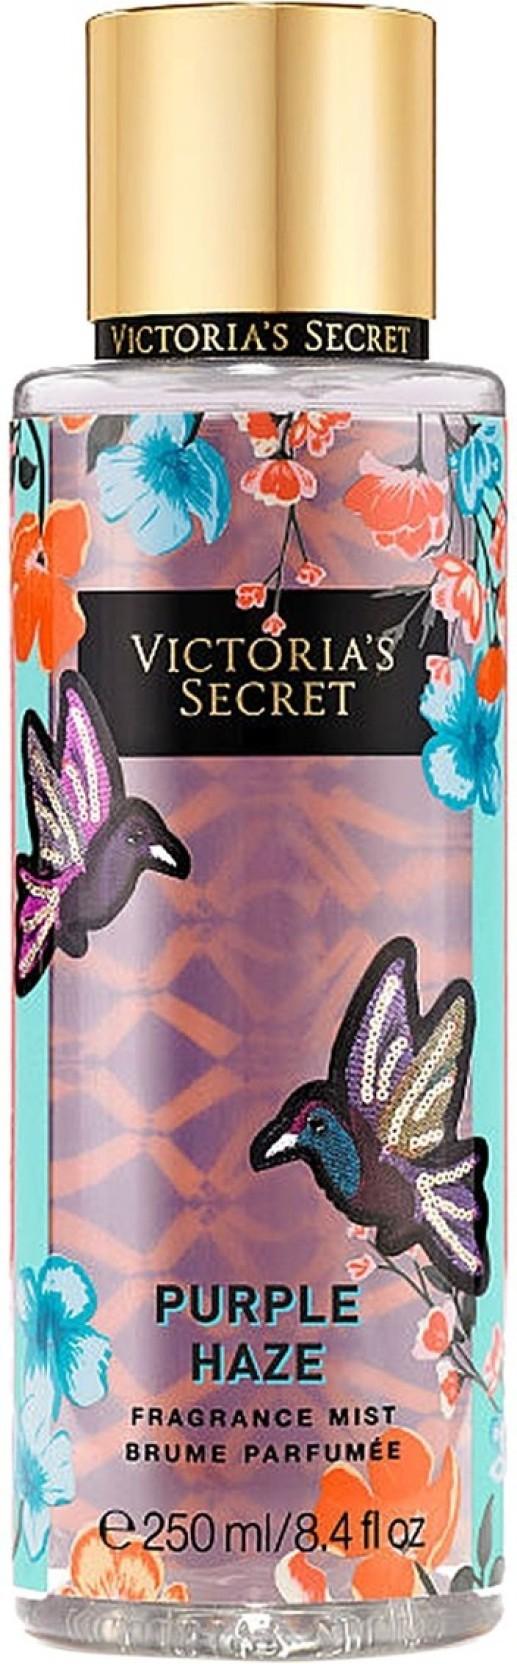 a70f08d6985 Victoria s Secret Purple Haze Fragrance Mist Body Mist - For Men   Women.  ADD TO CART